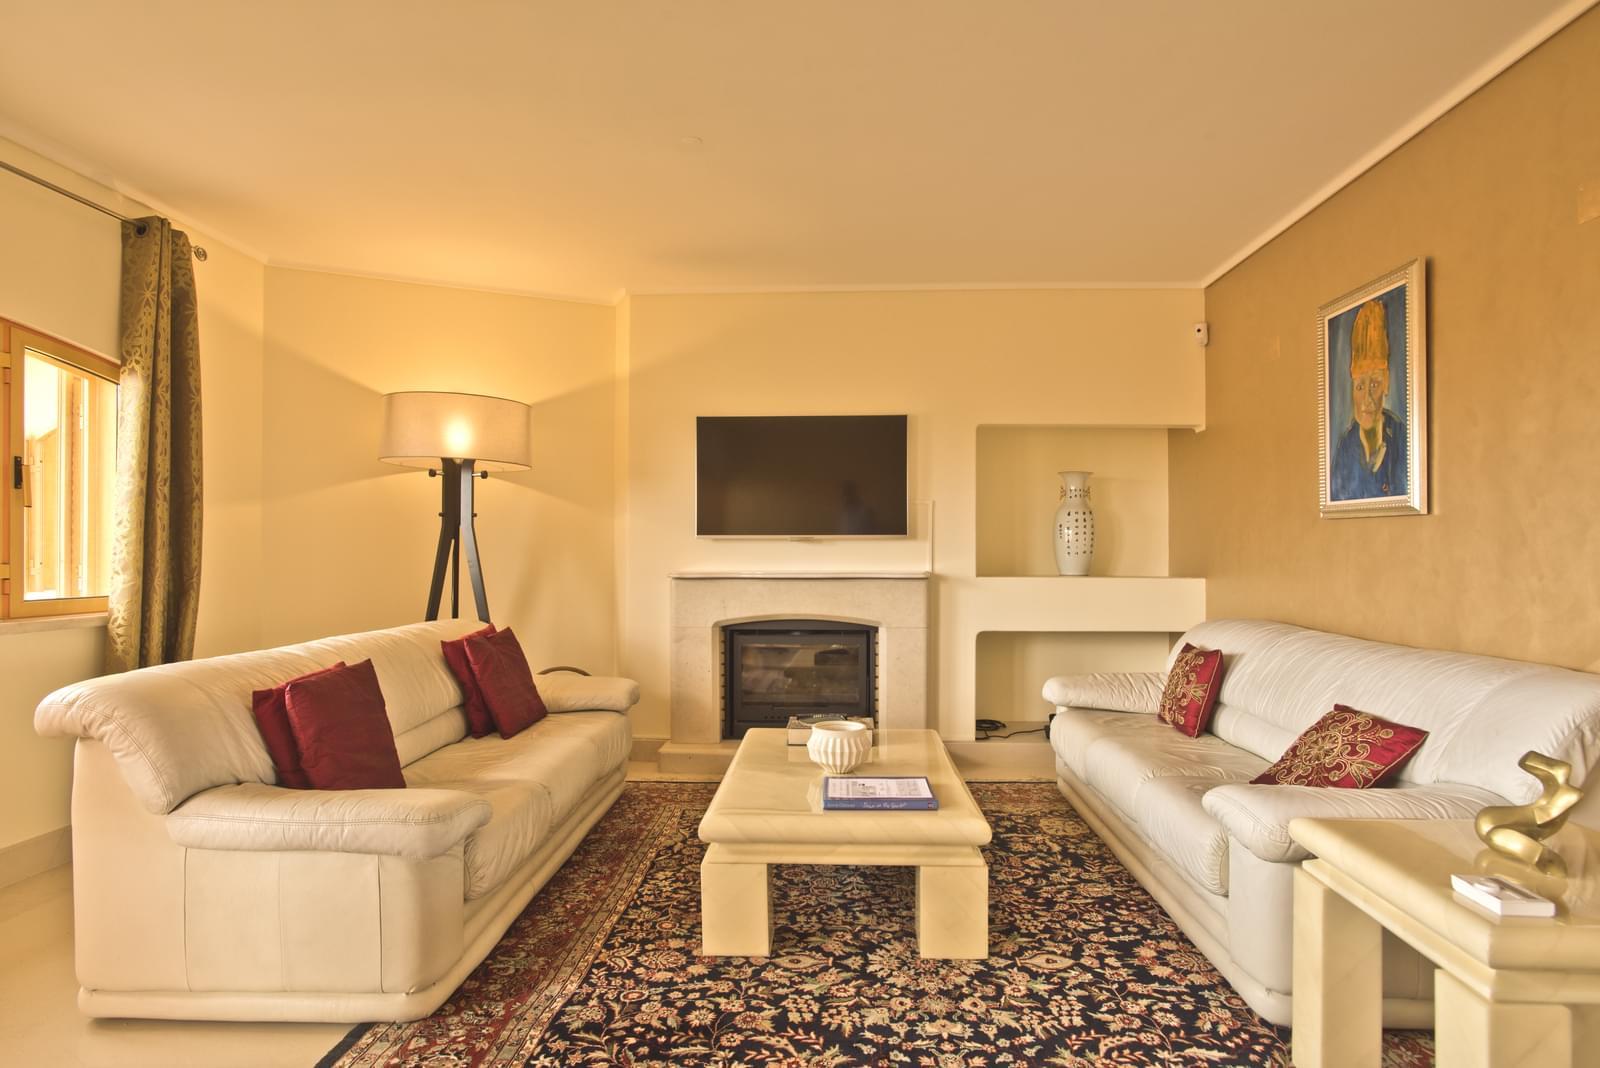 pf17156-apartamento-t3-cascais-c675ea31-5489-4797-b571-bd58ad5ae264